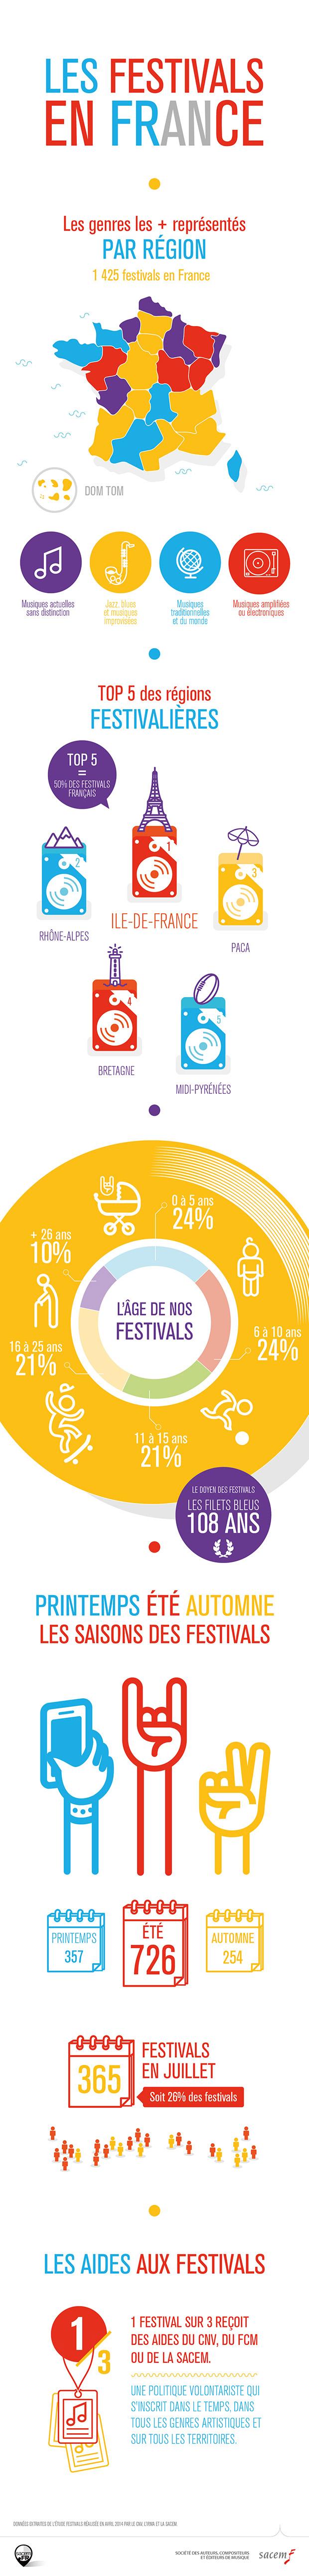 sacem-infographie_festival-01_620px-2